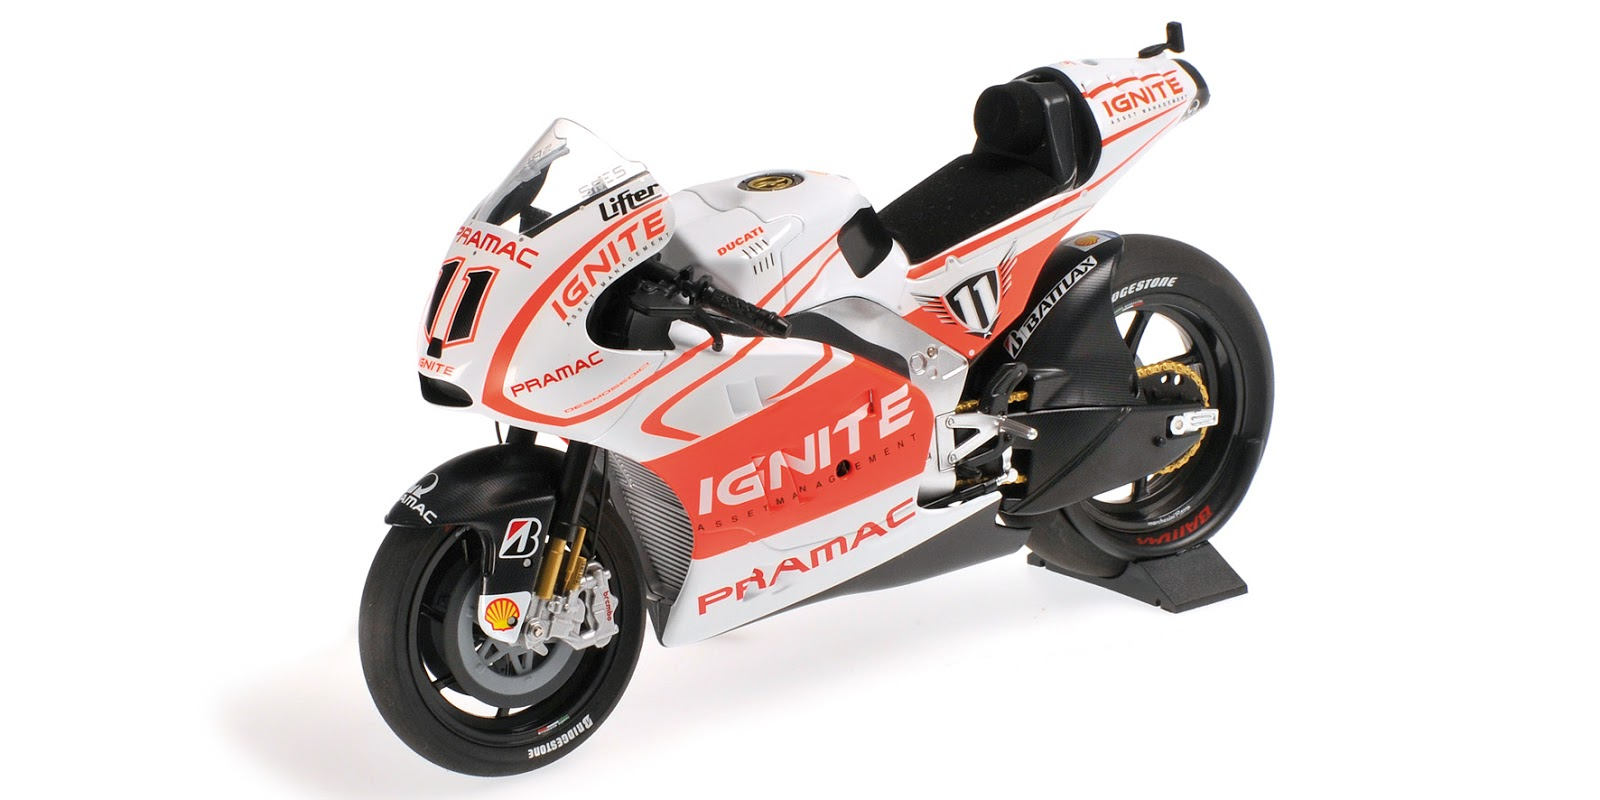 Racing Scale Models Ducati Desmosedici Bspies 2013 By Minichamps Tamiya Kits 112